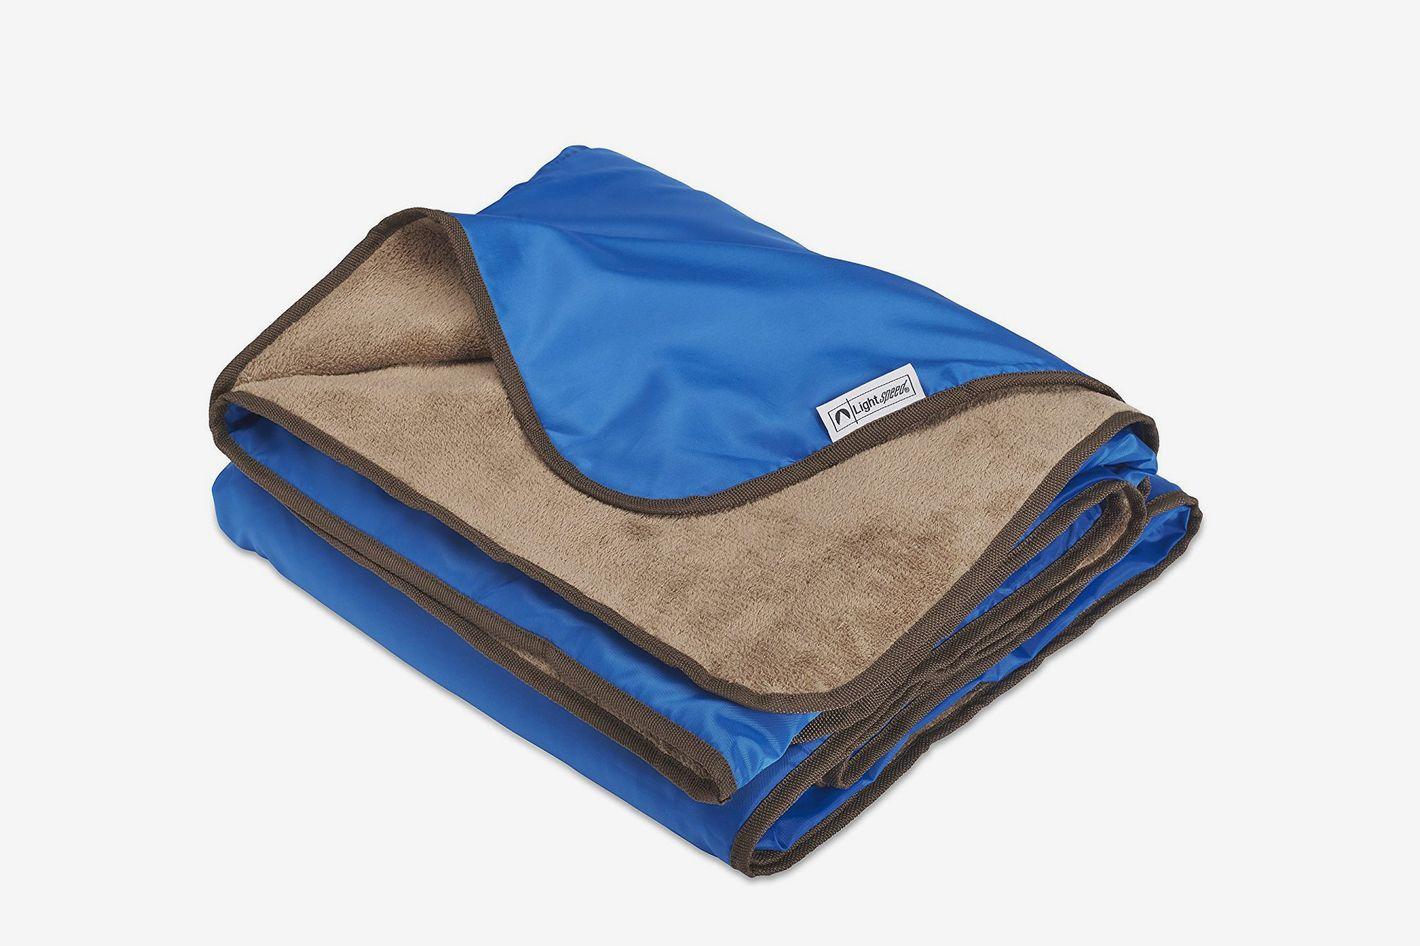 Lightspeed Outdoors XL Plush Fleece Outdoor Stadium Rainproof and Windproof Picnic Blanket